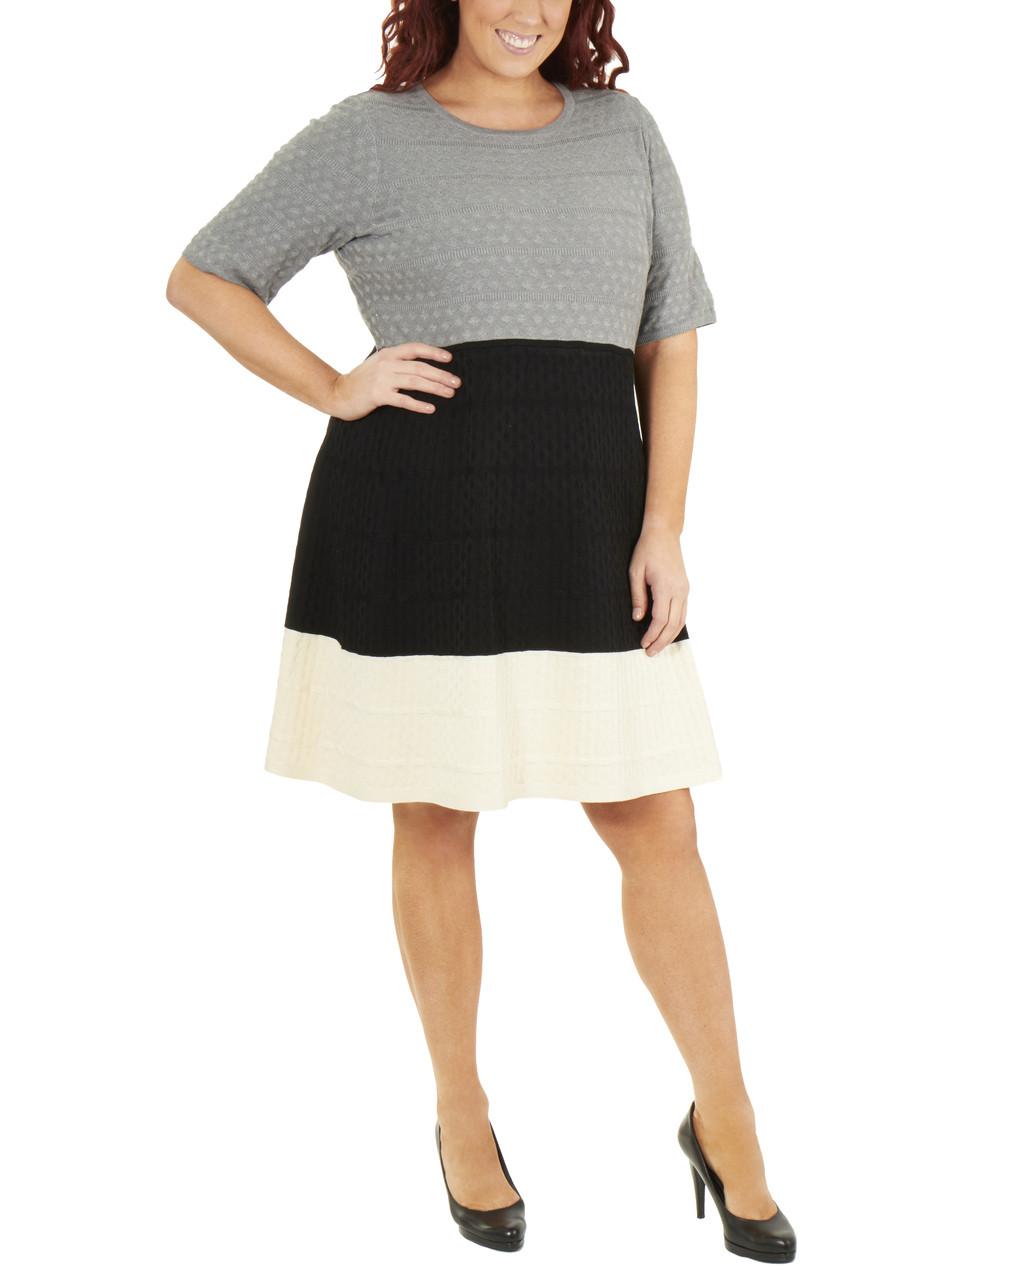 Plus Size Elbow Sleeve Colorblock Dress~Malena*WSOD0240